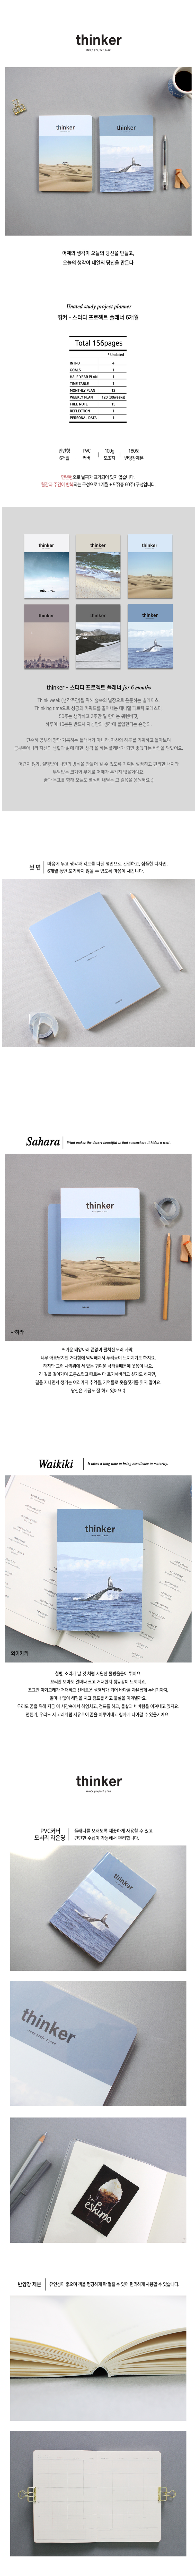 Thinker - study project planner ss - 대시앤도트, 10,500원, 플래너, 스터디플래너